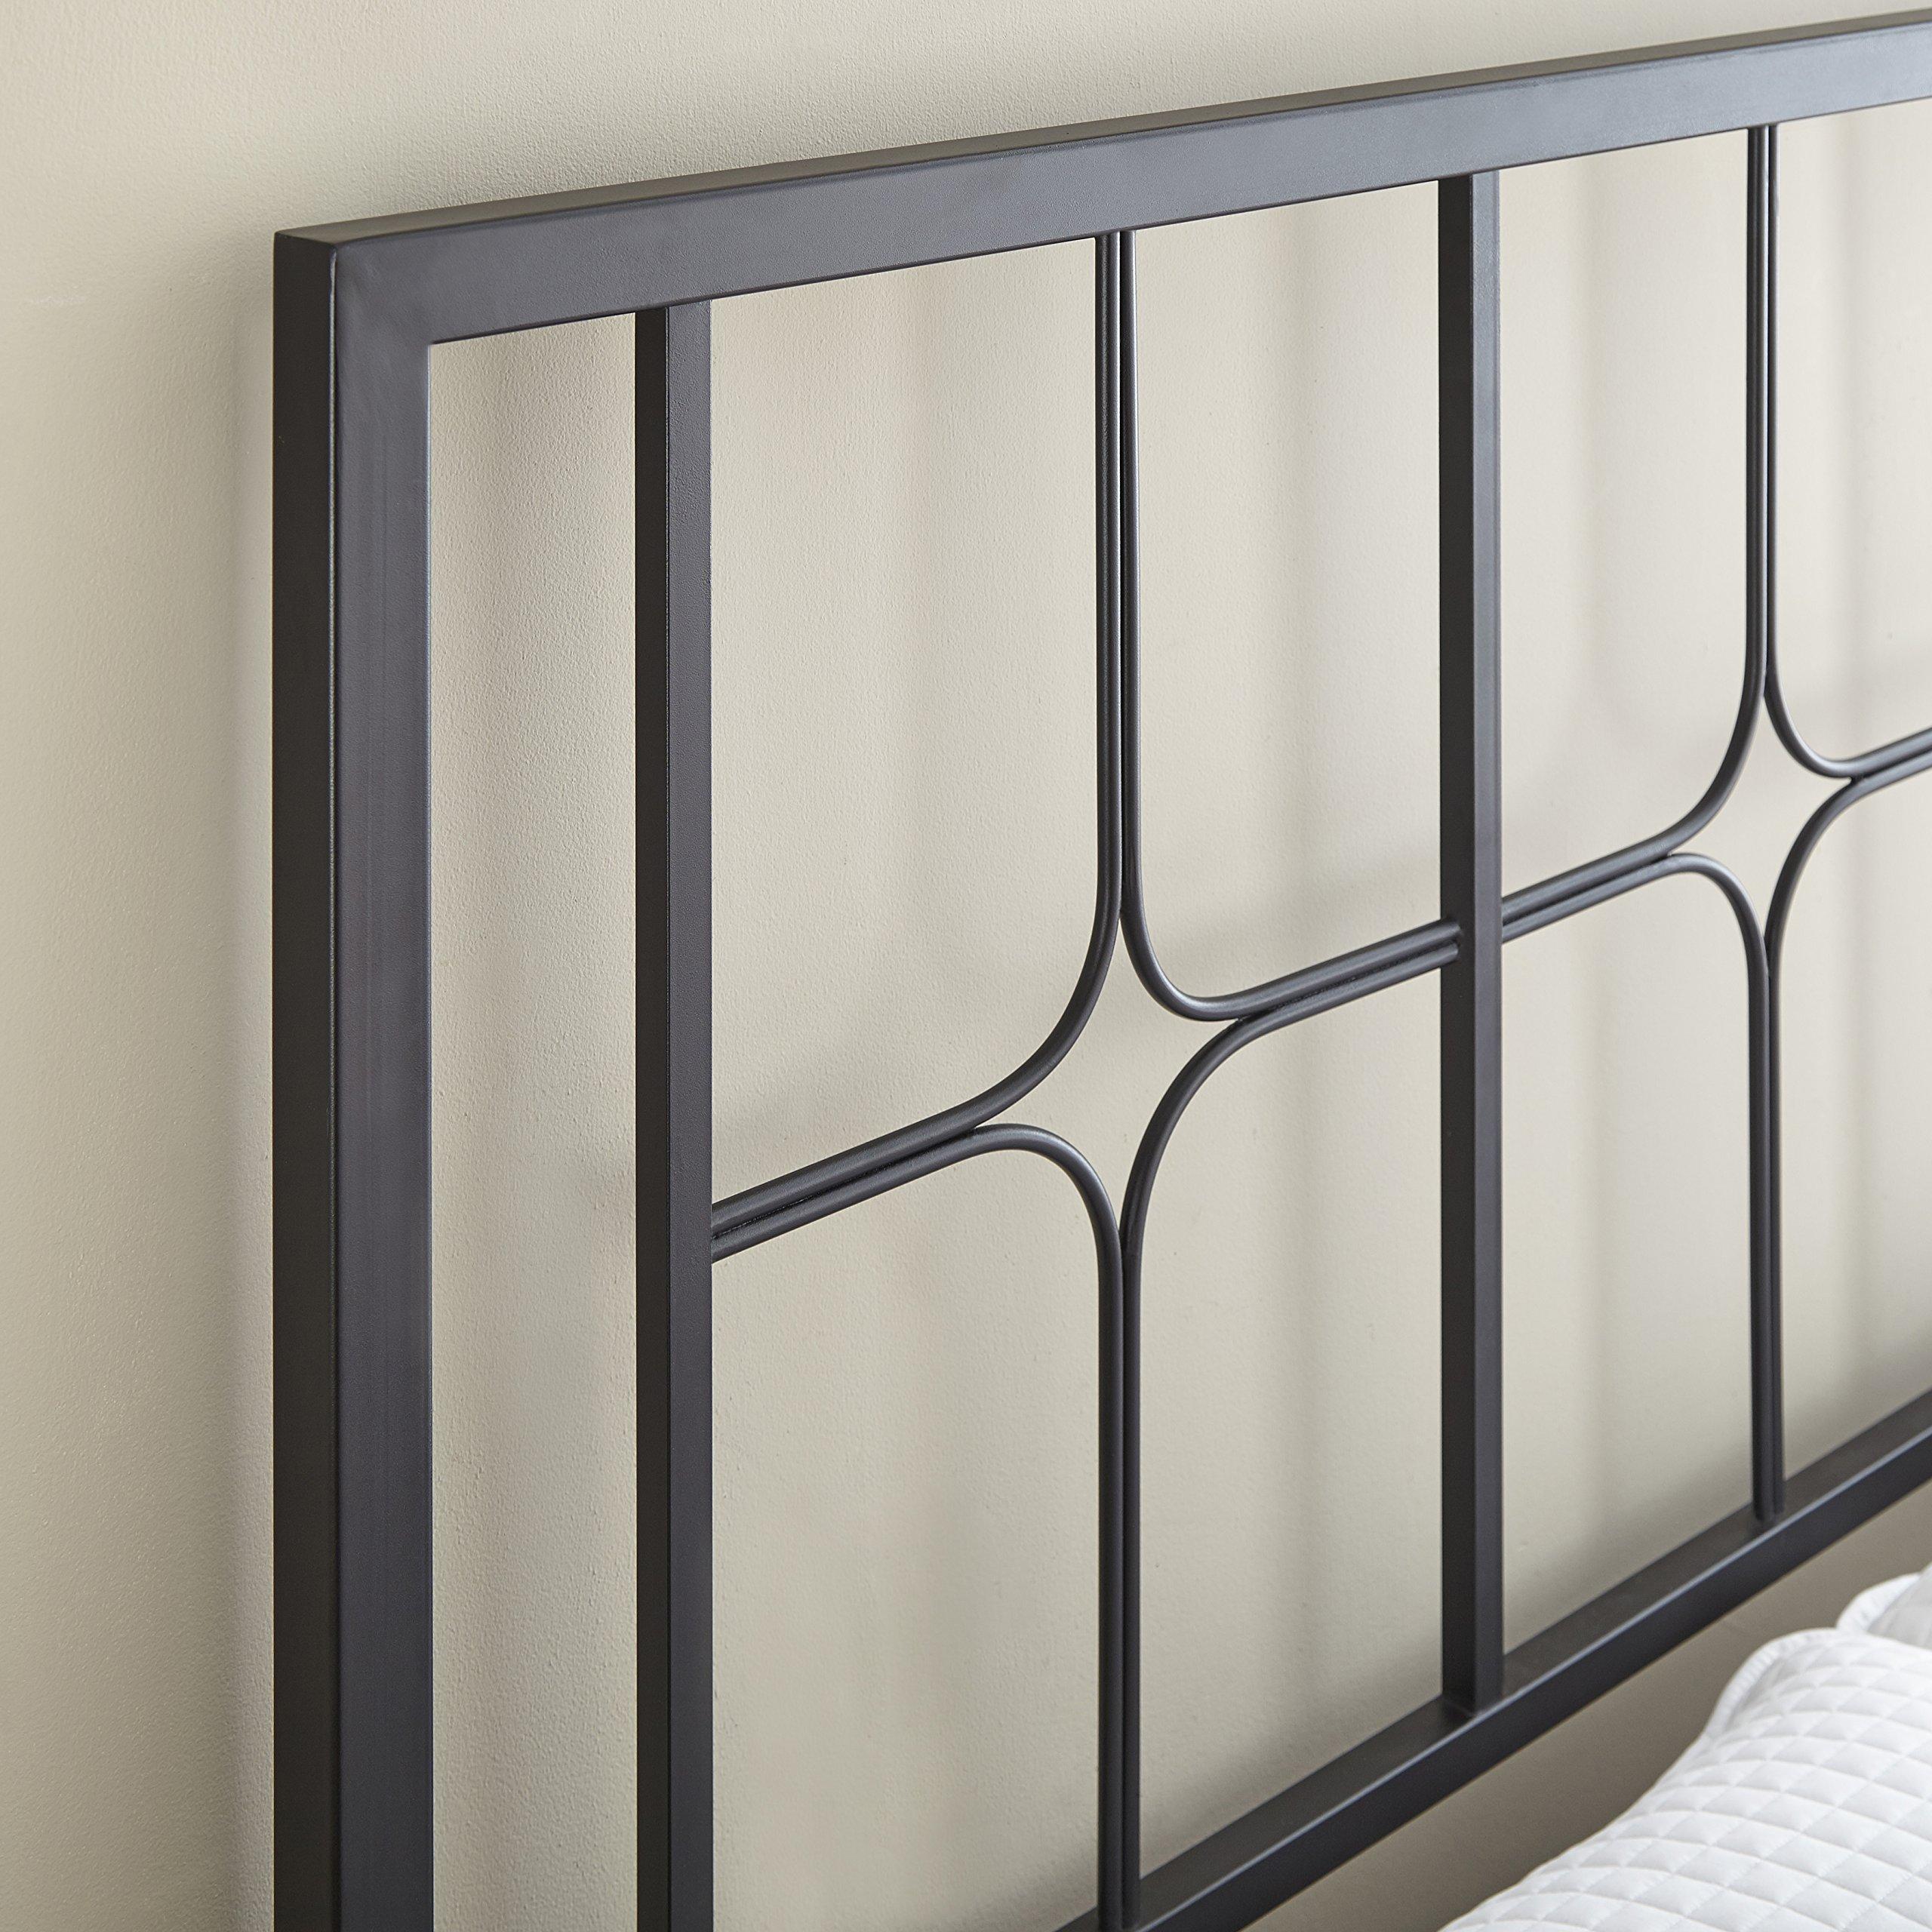 Flex Form Lydia Metal Platform Bed Frame / Mattress Foundation with Headboard and Footboard, King by Flex Form (Image #3)